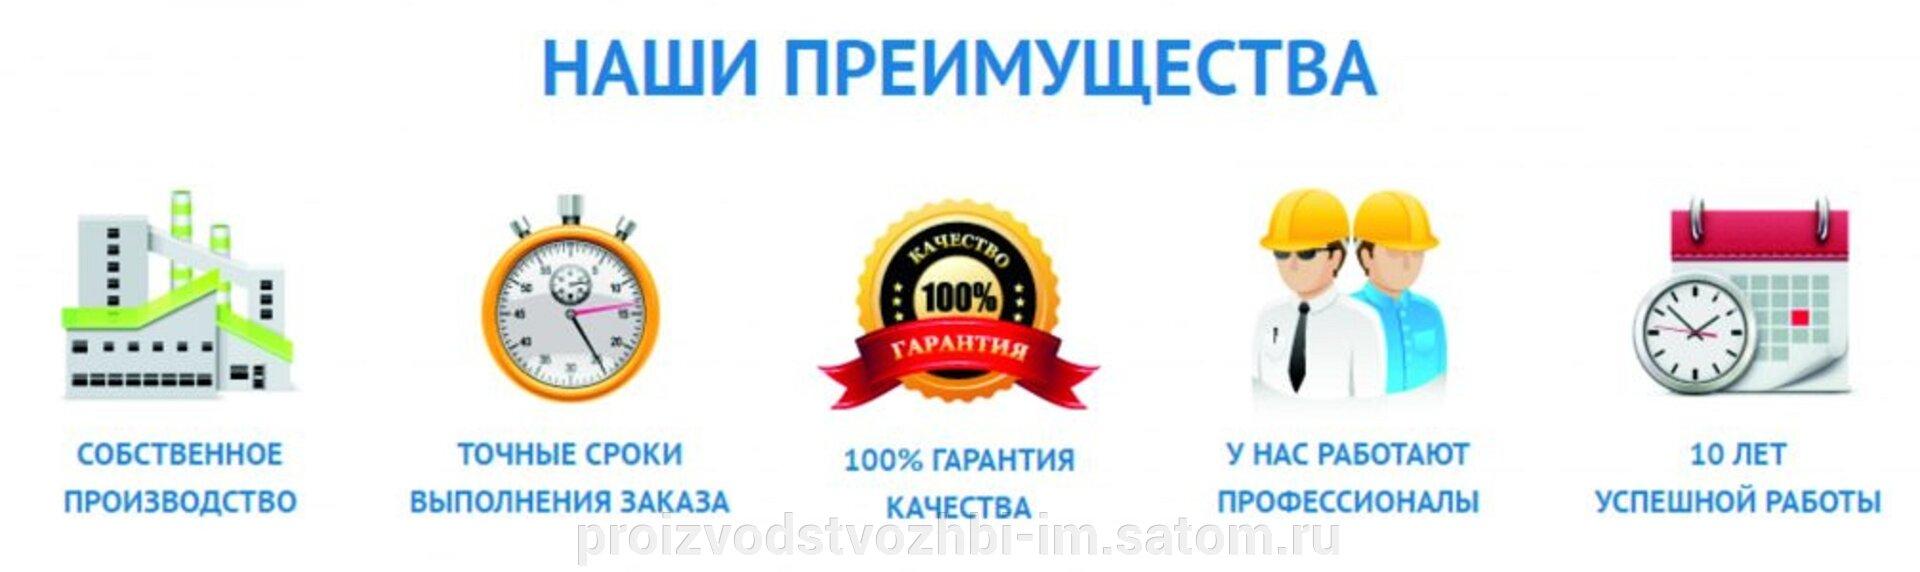 Лоток кабельный ЛК300.300.150-13 - фото pic_ca3ccaecdcfa139a1d379873625f01bd_1920x9000_1.jpg